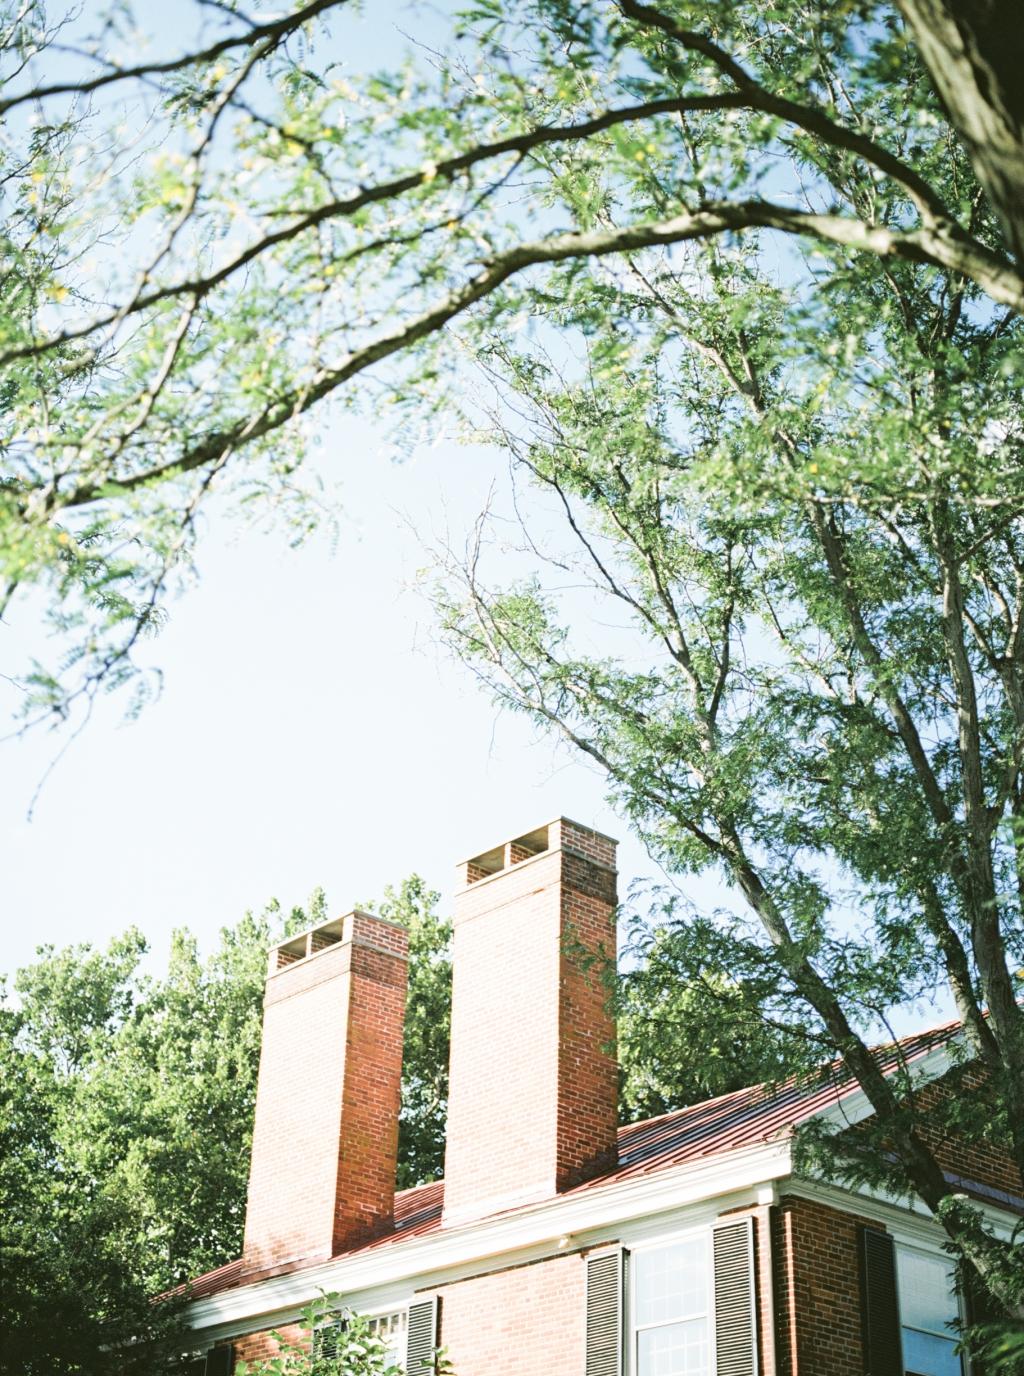 haley-richter-photography-buena-vista-confrence-center-wedding-summer-203